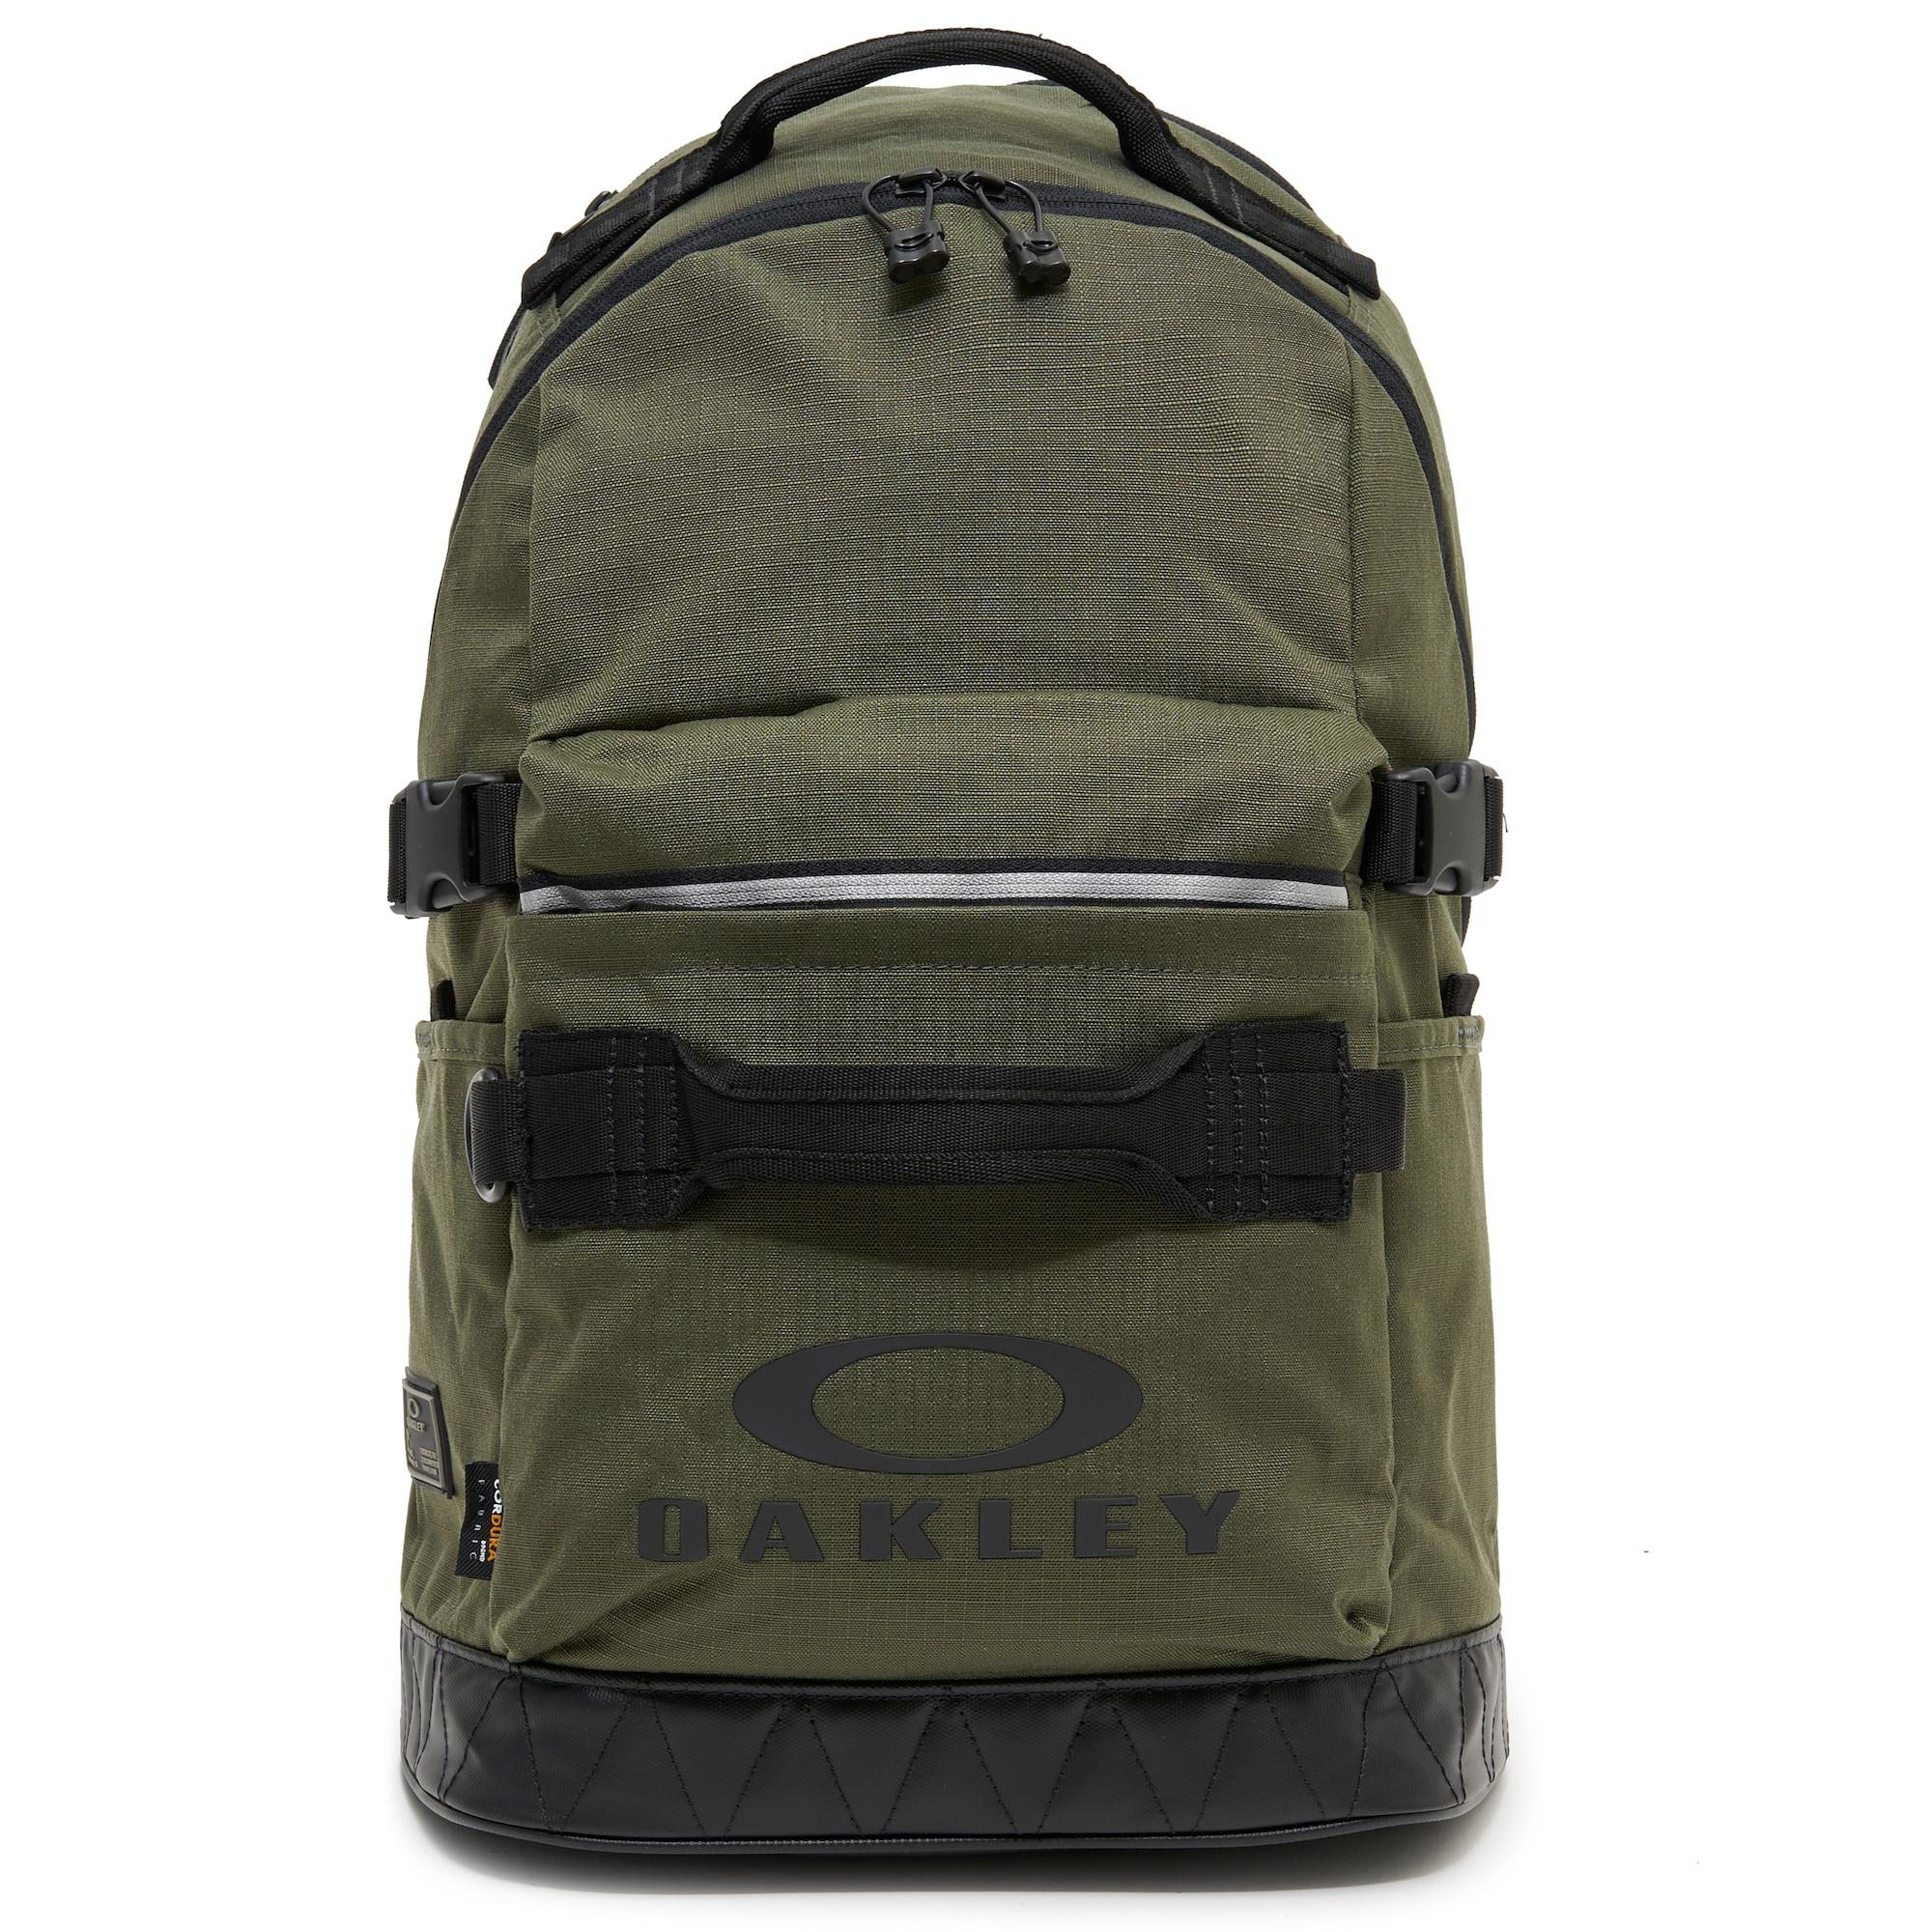 Mochila Utility Backpack